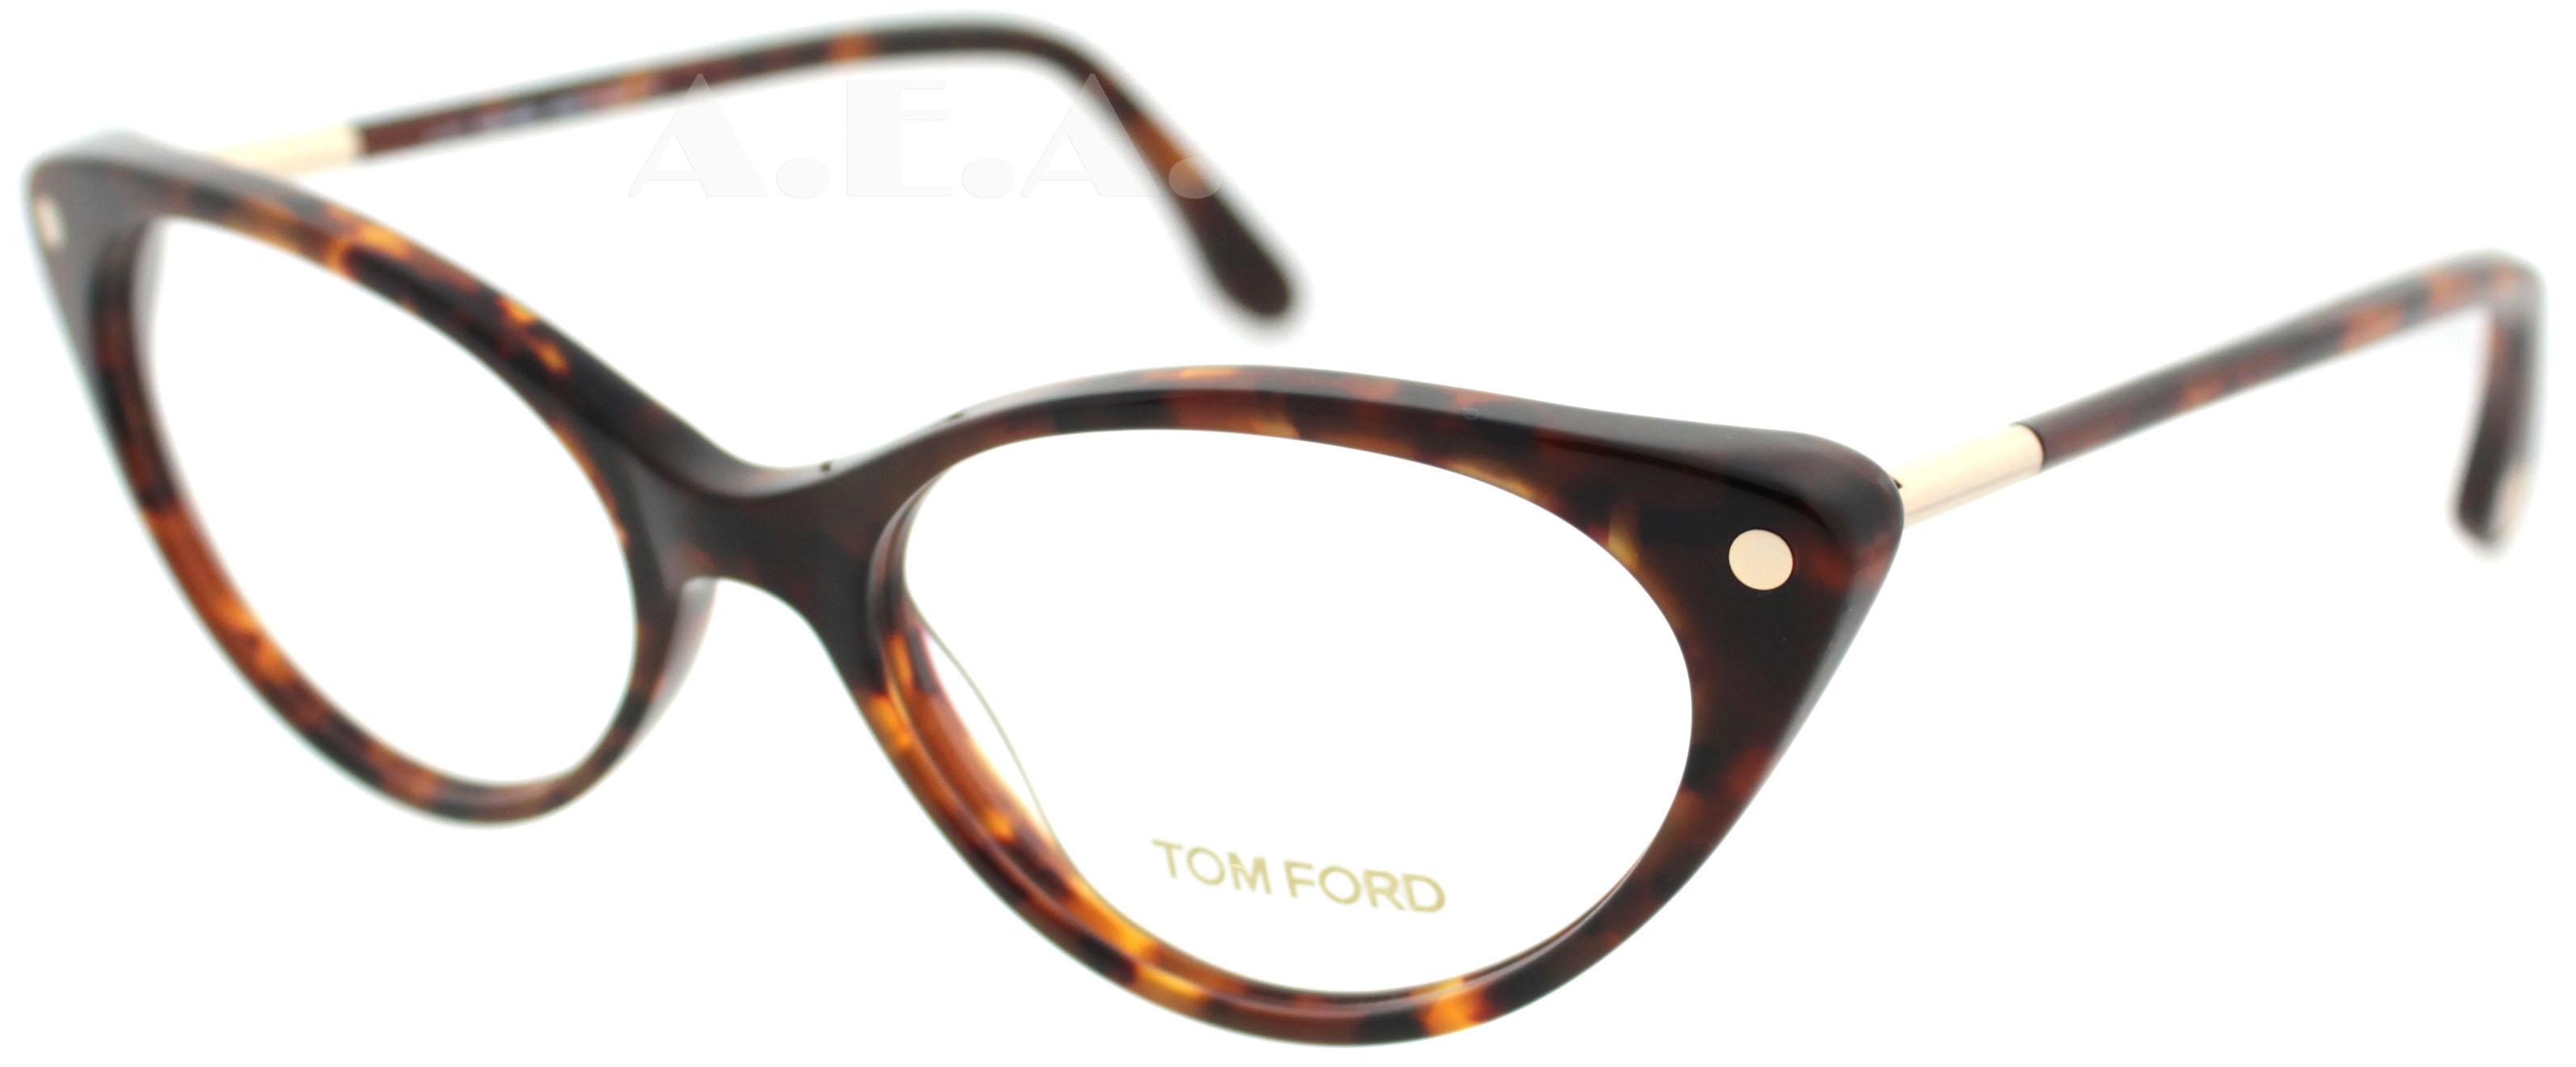 Tom Ford Eyeglasses  Buy Online at SmartBuyGlasses USA